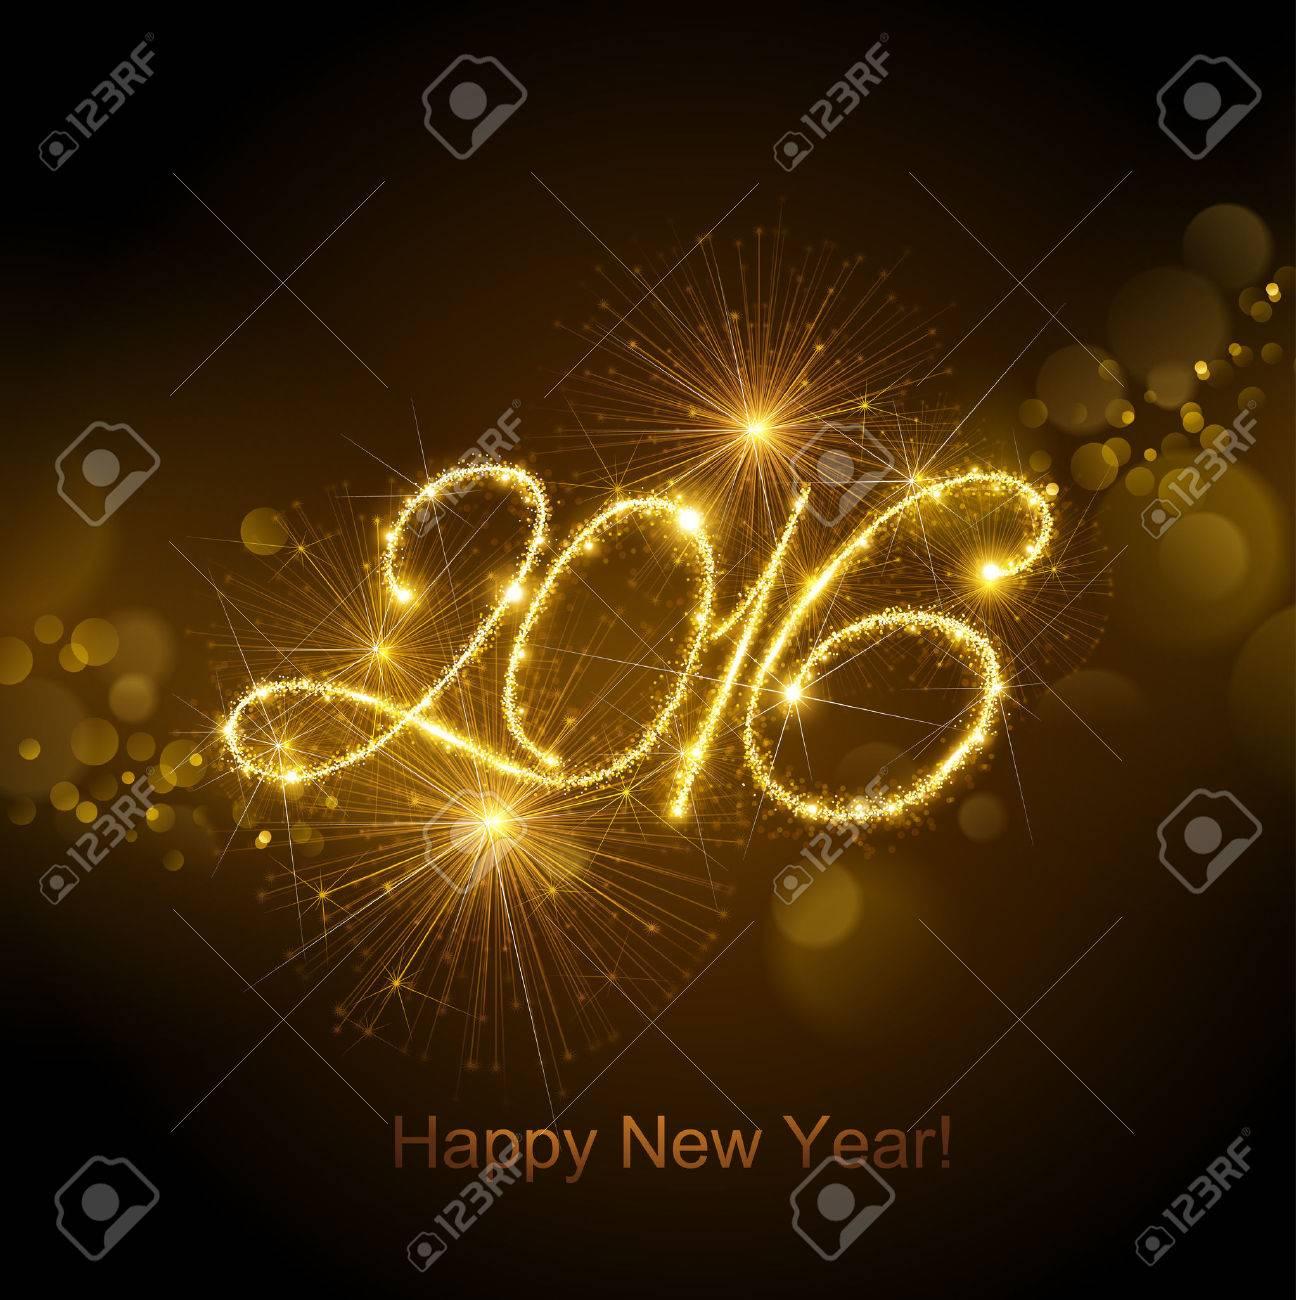 New Year fireworks and confetti 2016. Vector illustration. Standard-Bild - 44614042